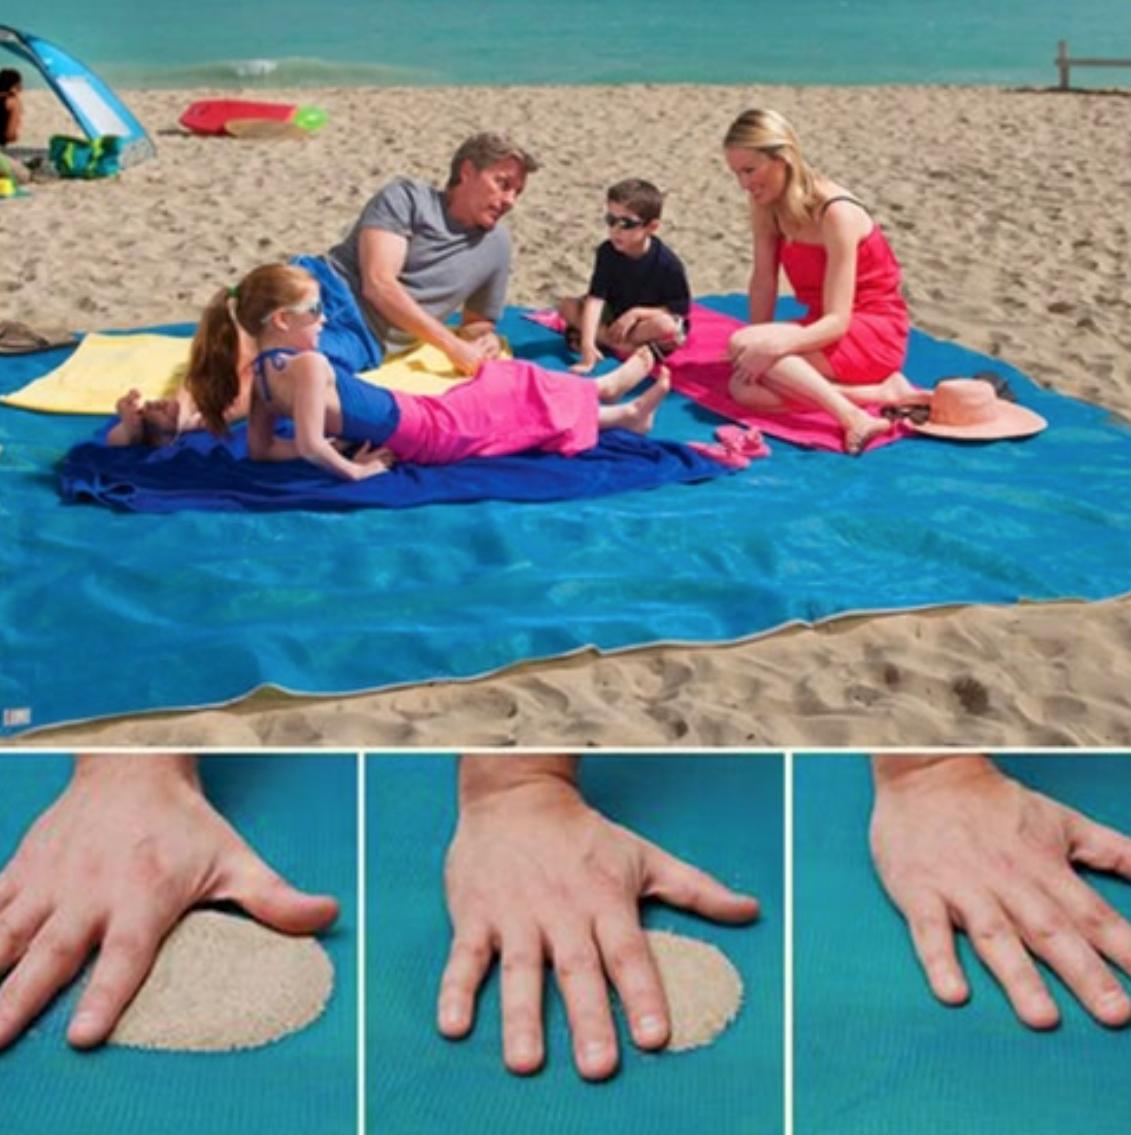 Heiße Sommer Strandmatte ohne Sand Probleme ;)